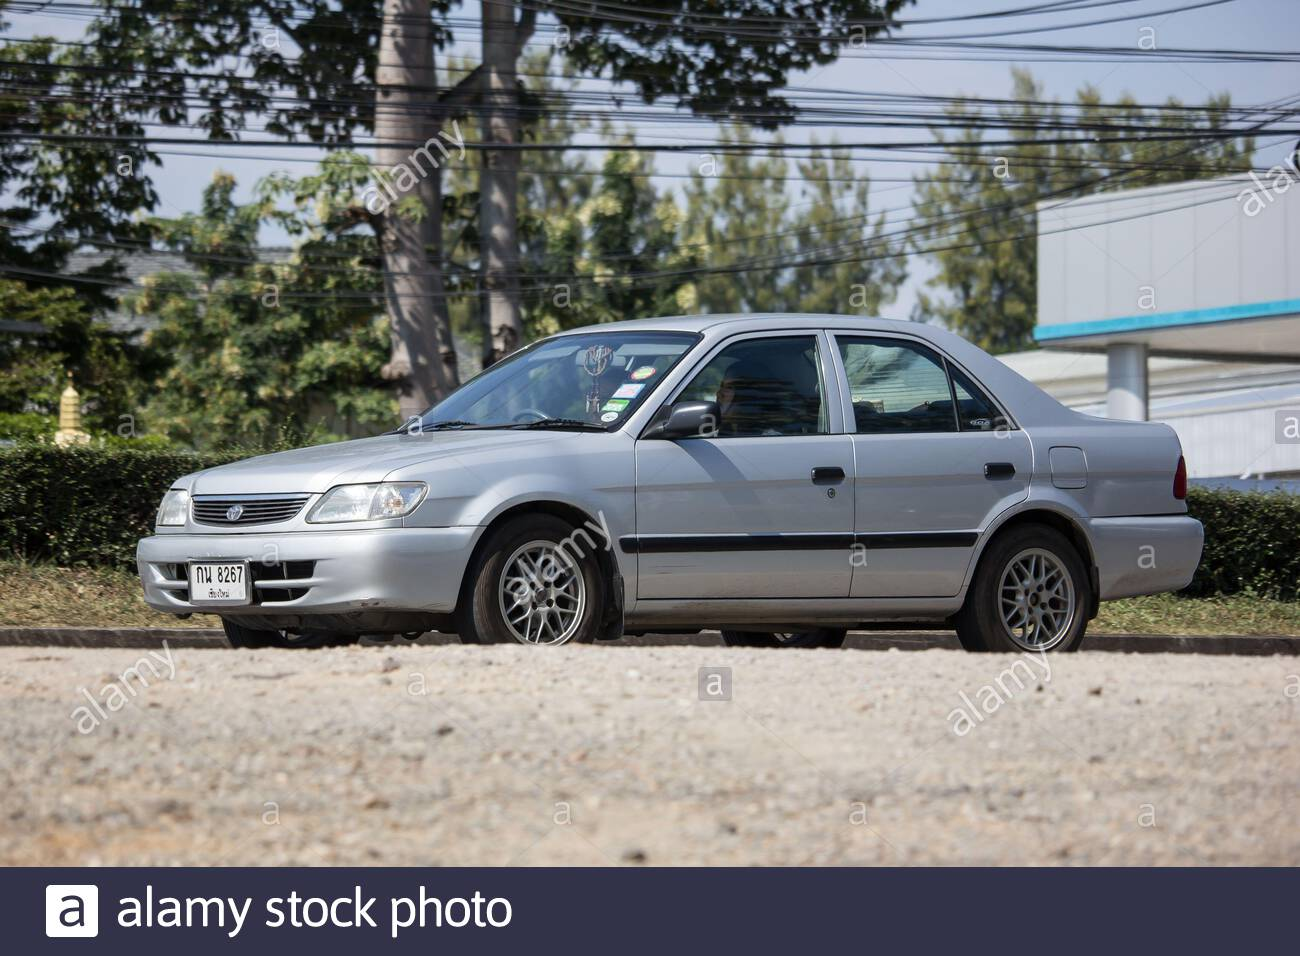 Kelebihan Kekurangan Toyota Soluna 2002 Top Model Tahun Ini